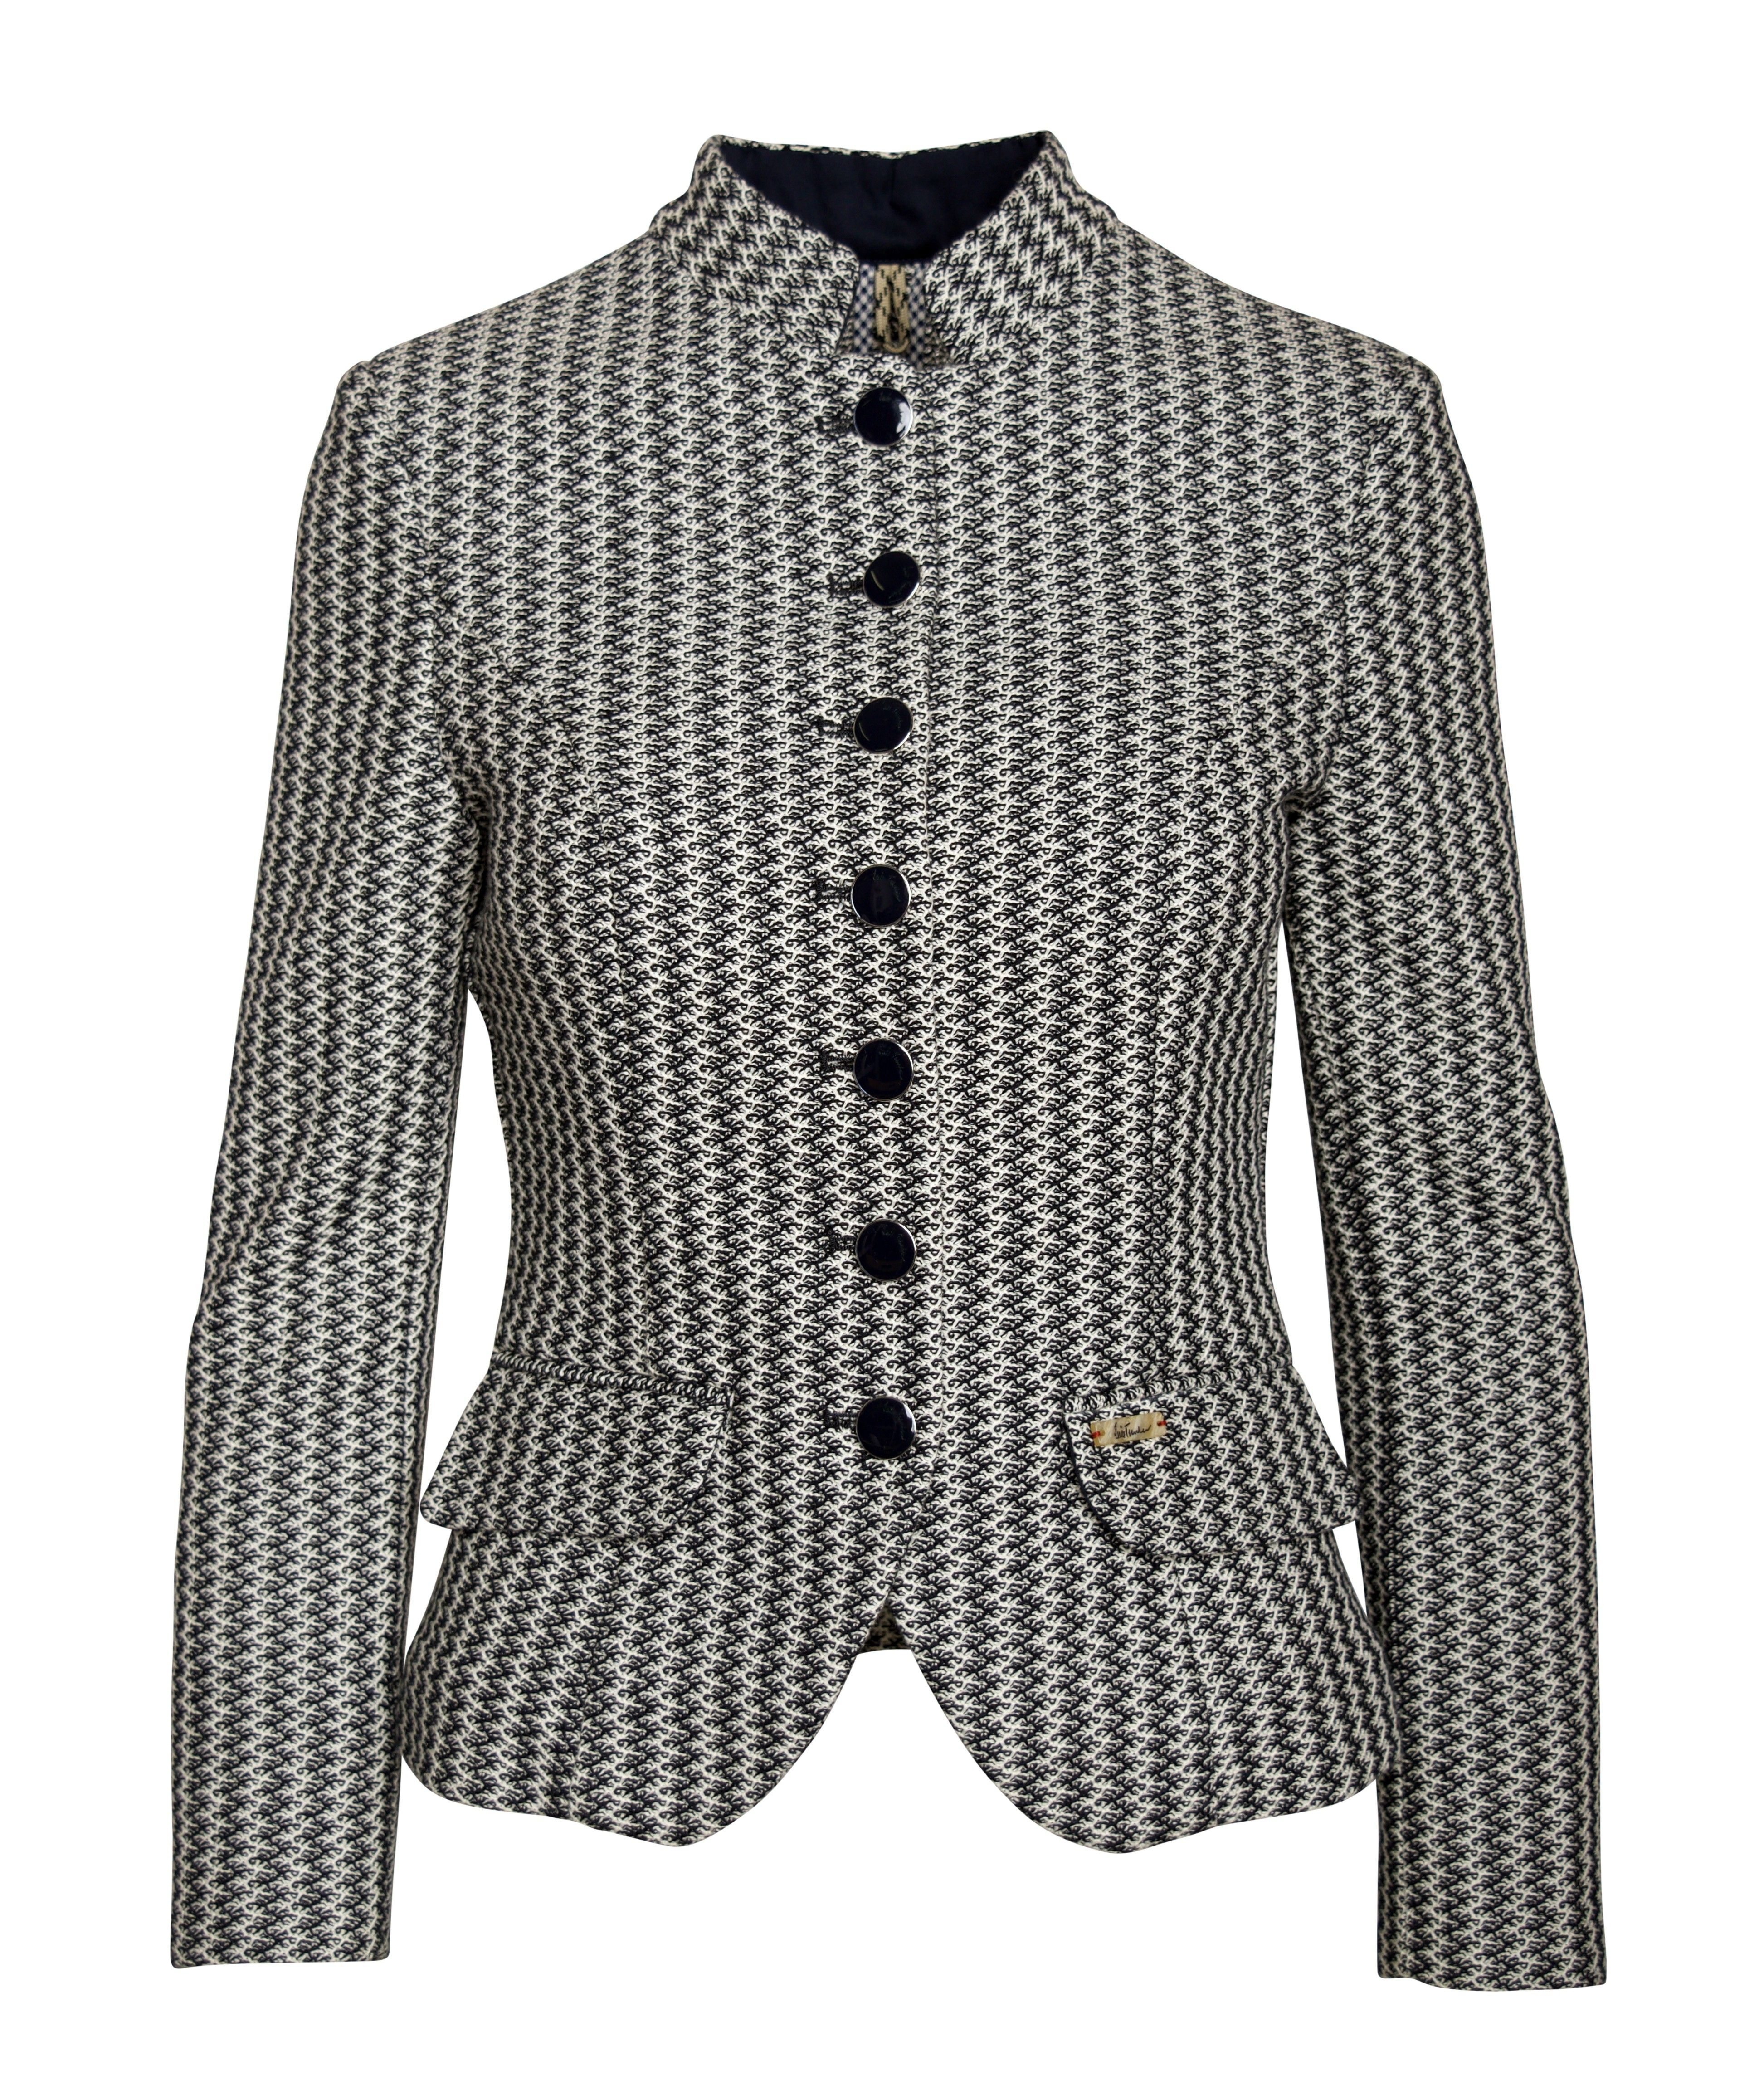 LUIS TRENKER - Damen Blazer - Randa Jersey Crochet - Dunkelblau